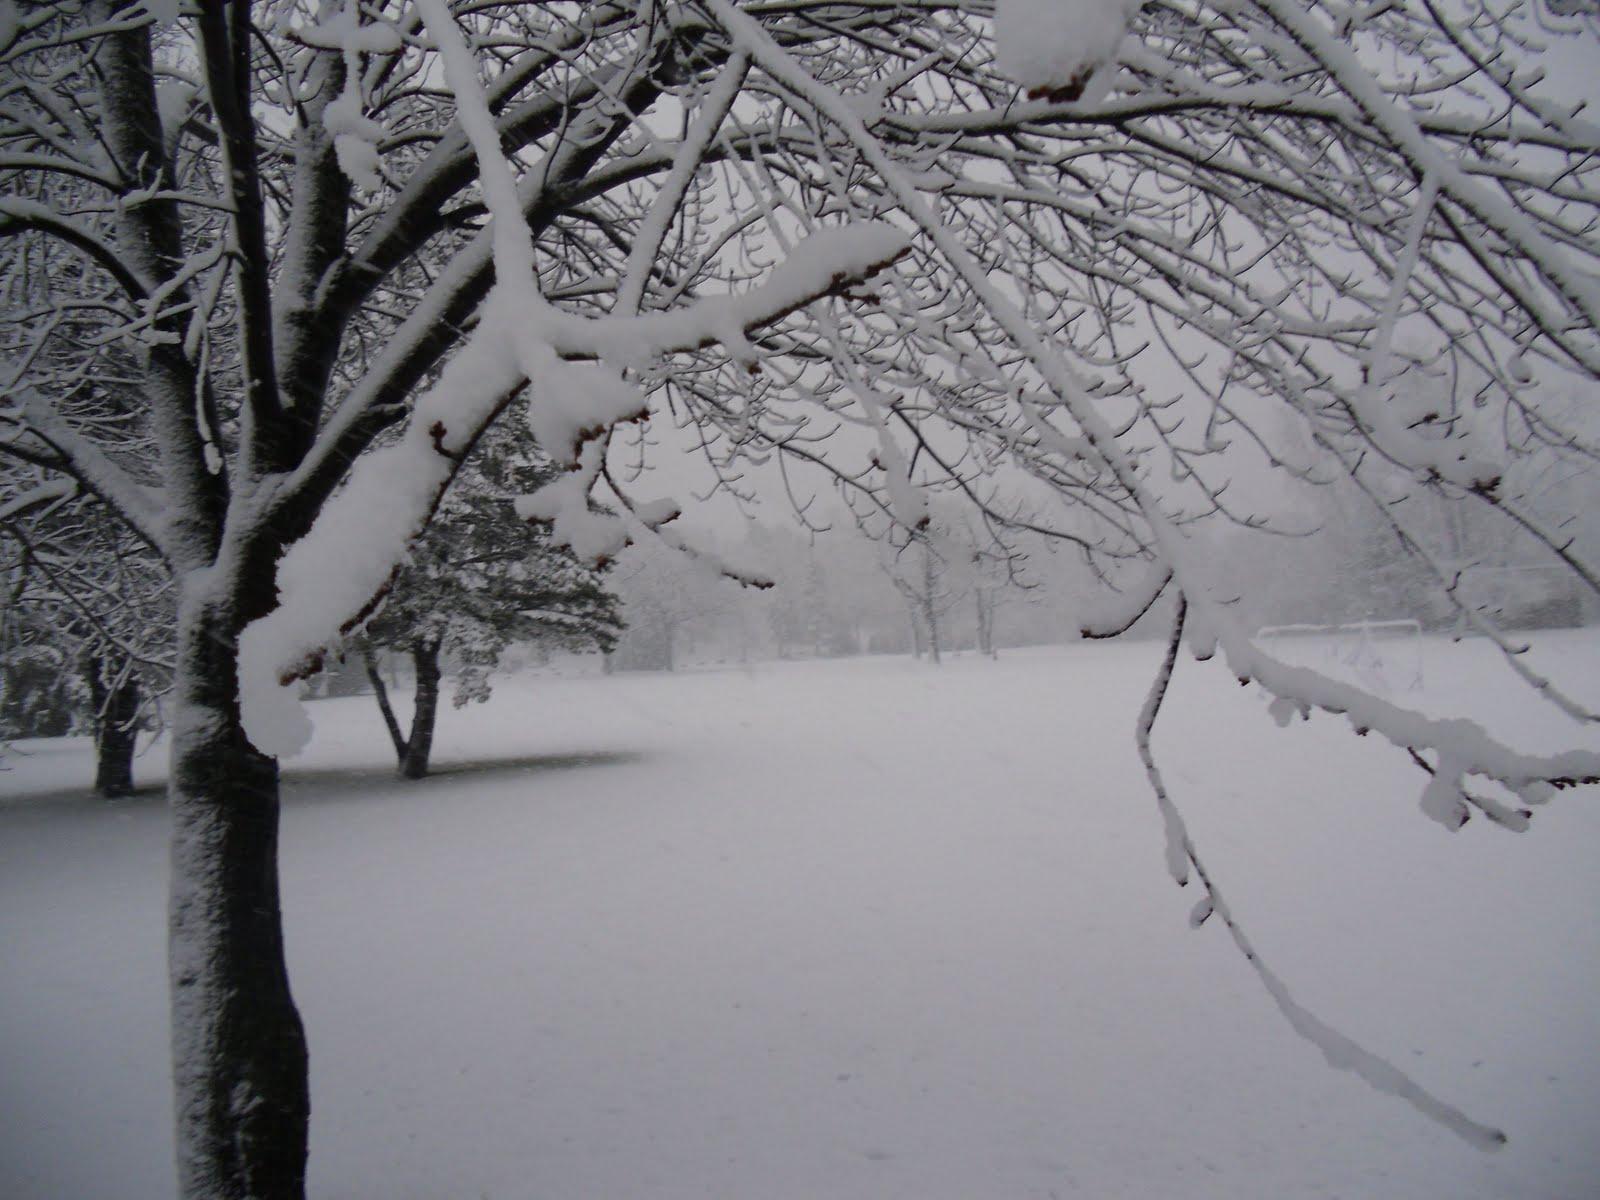 snow2 - amazing photos of snow falling